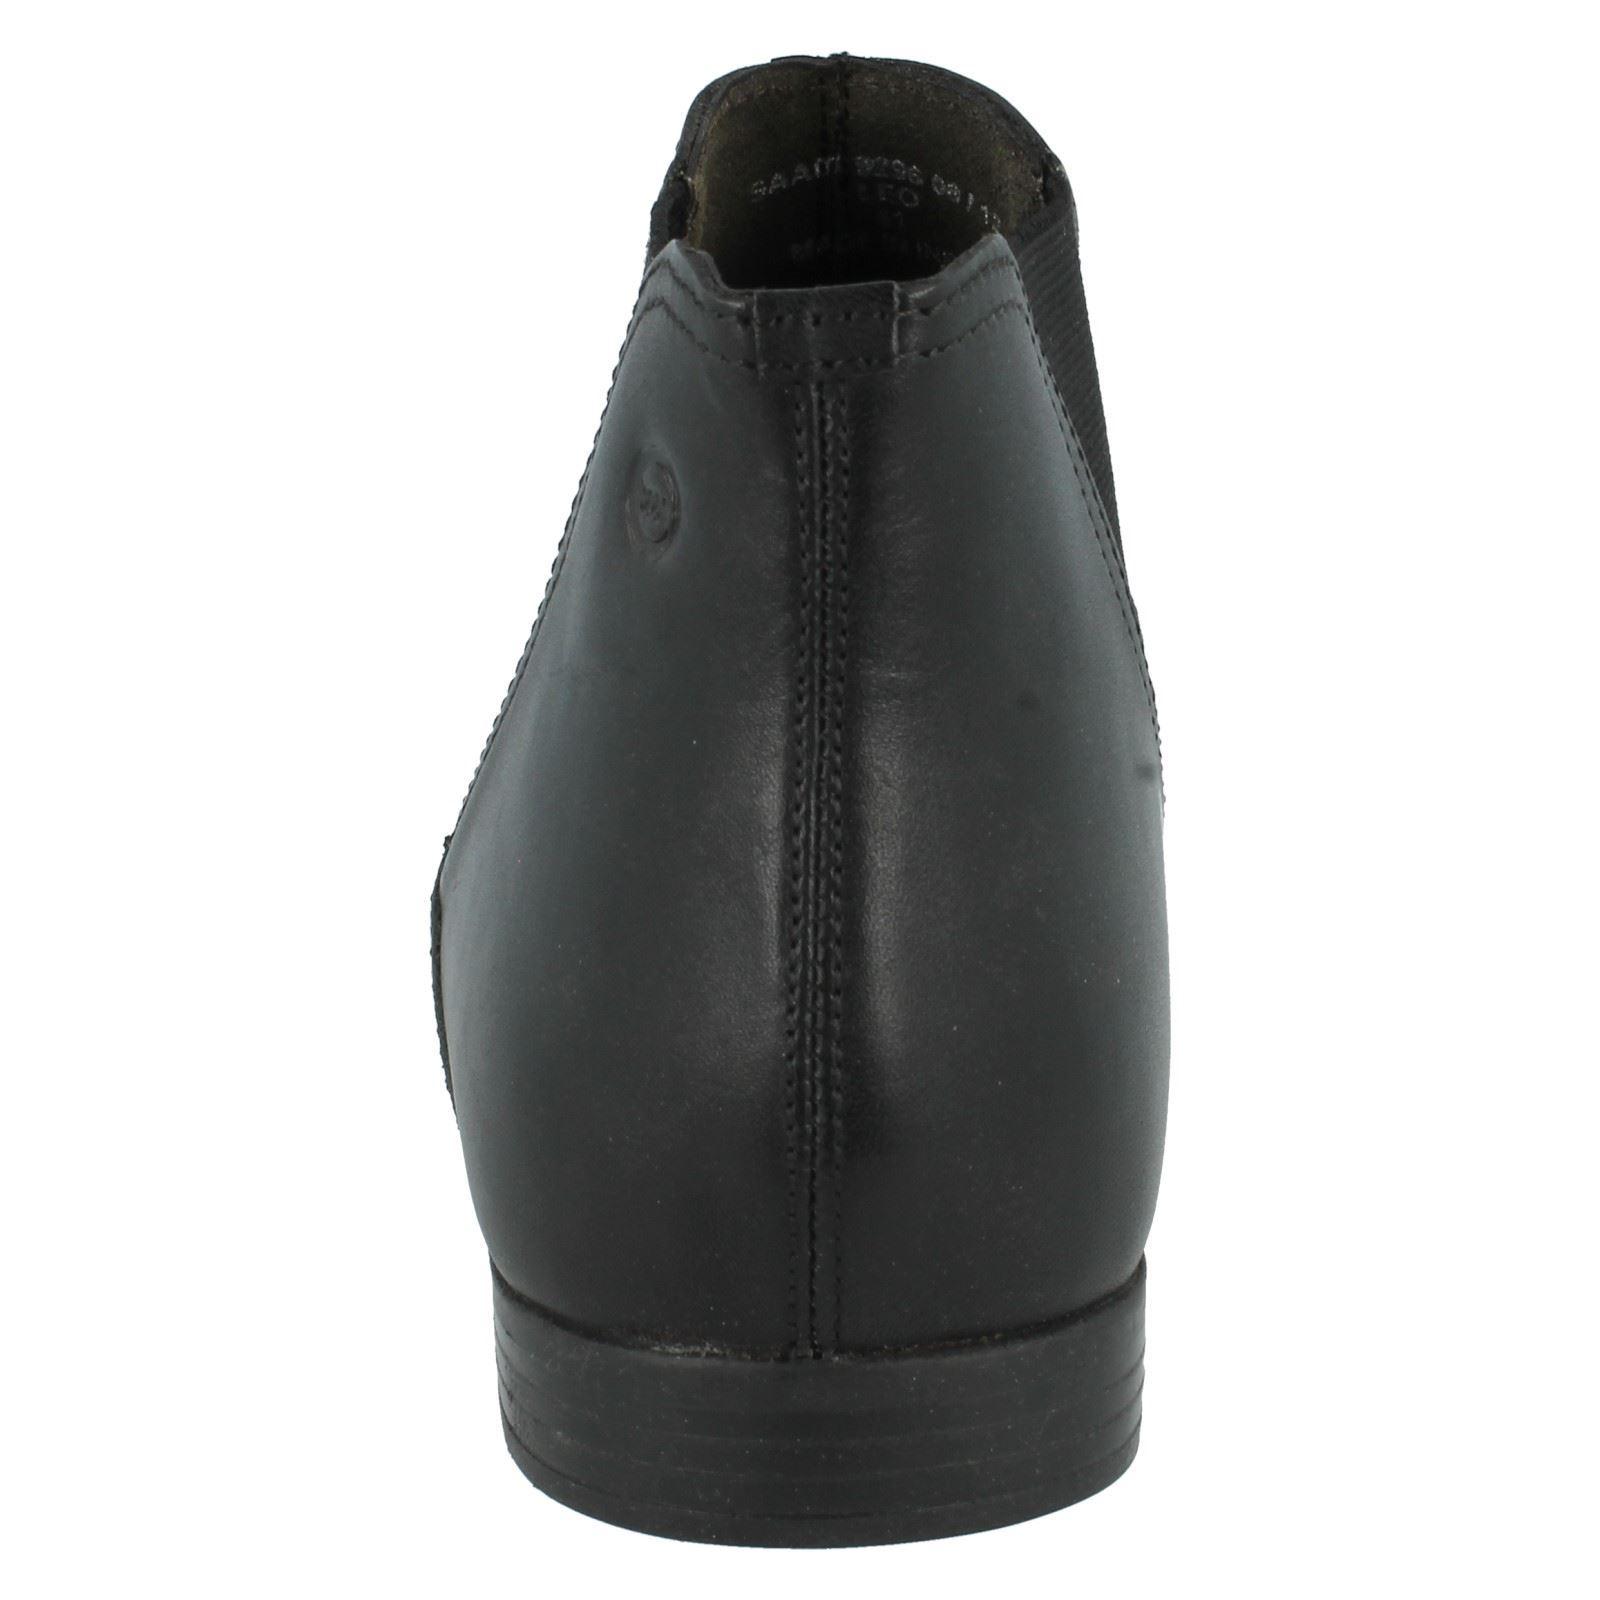 Hommes Adidas equipHommes t support RF RF RF Noir/Blanc (PF27) RRP .99 a26d09